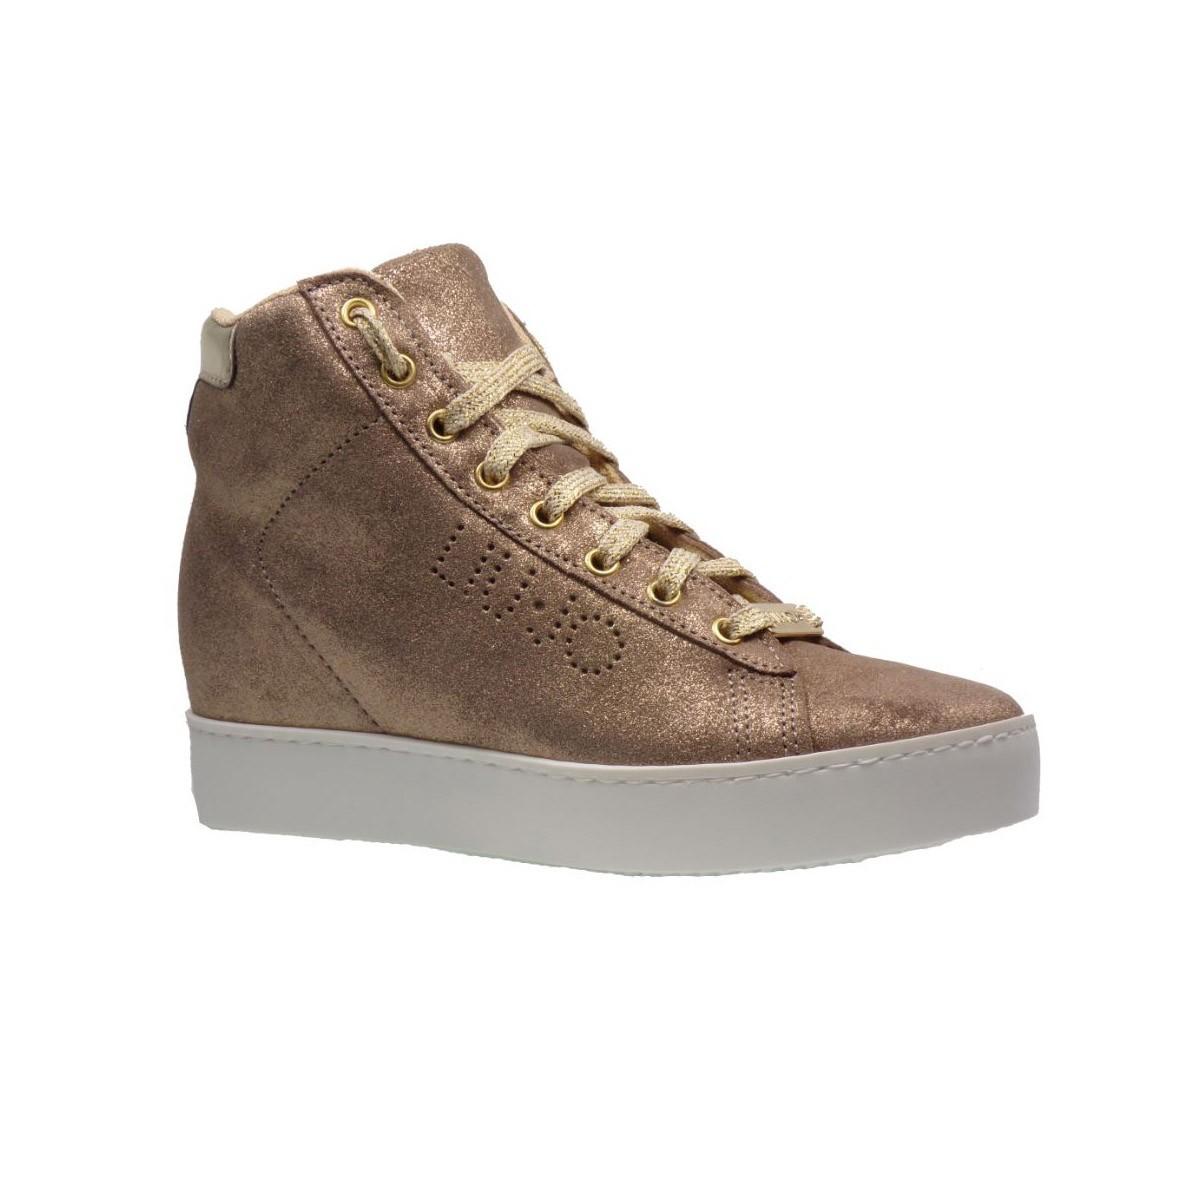 c01985712ed Liu-Jo Sneakers Παπούτσια Γυναικεία Y9440 Χρυσό |Γυναικεία & Ανδρικά  Παπούτσια - BagiotaShoes.gr